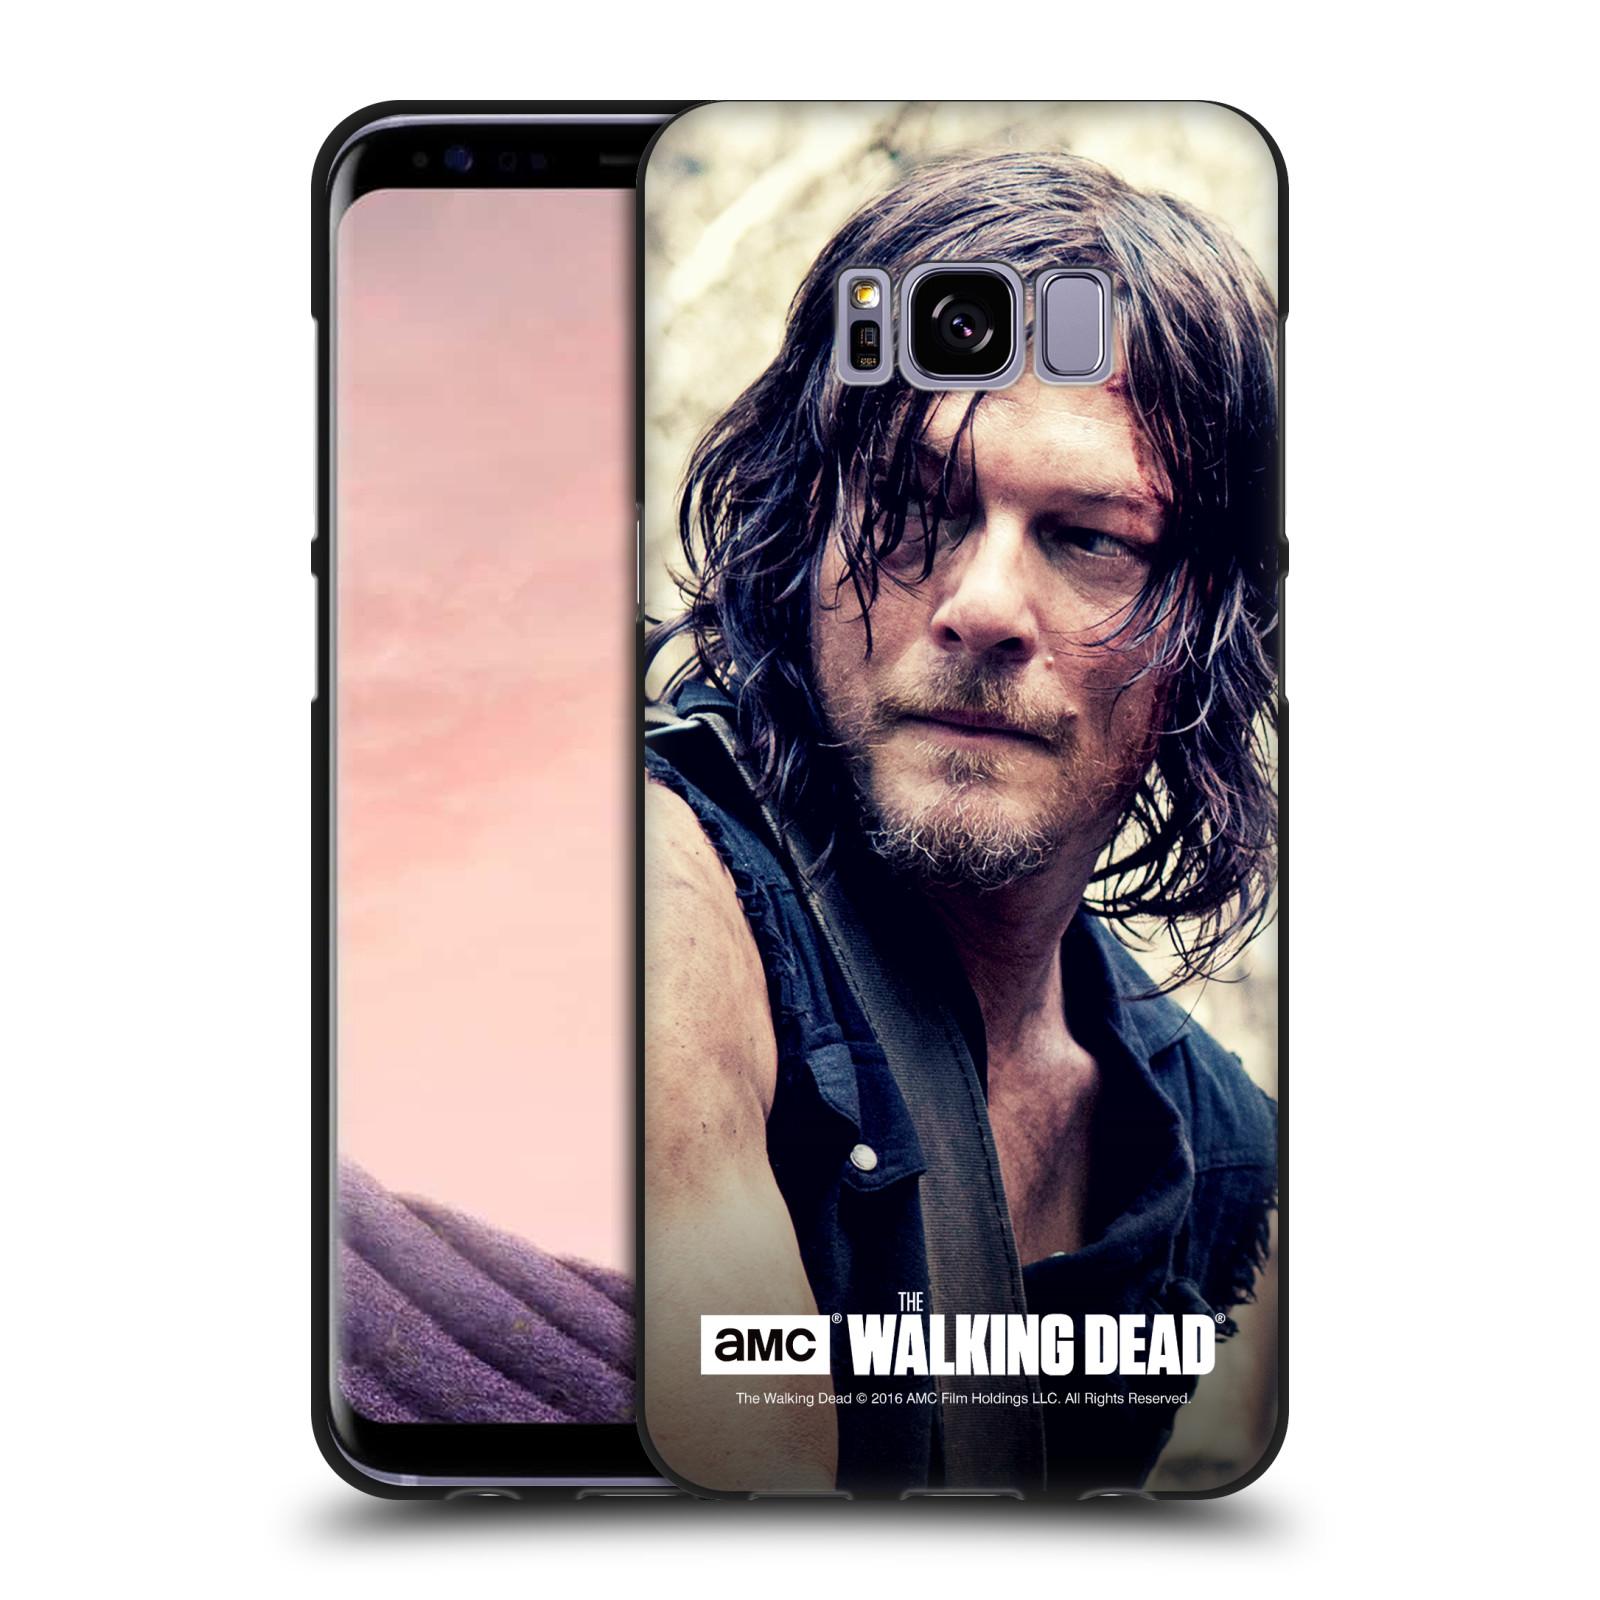 Oficial-AMC-The-Walking-Dead-Daryl-Dixon-Negro-Gel-caso-para-telefonos-Samsung-1